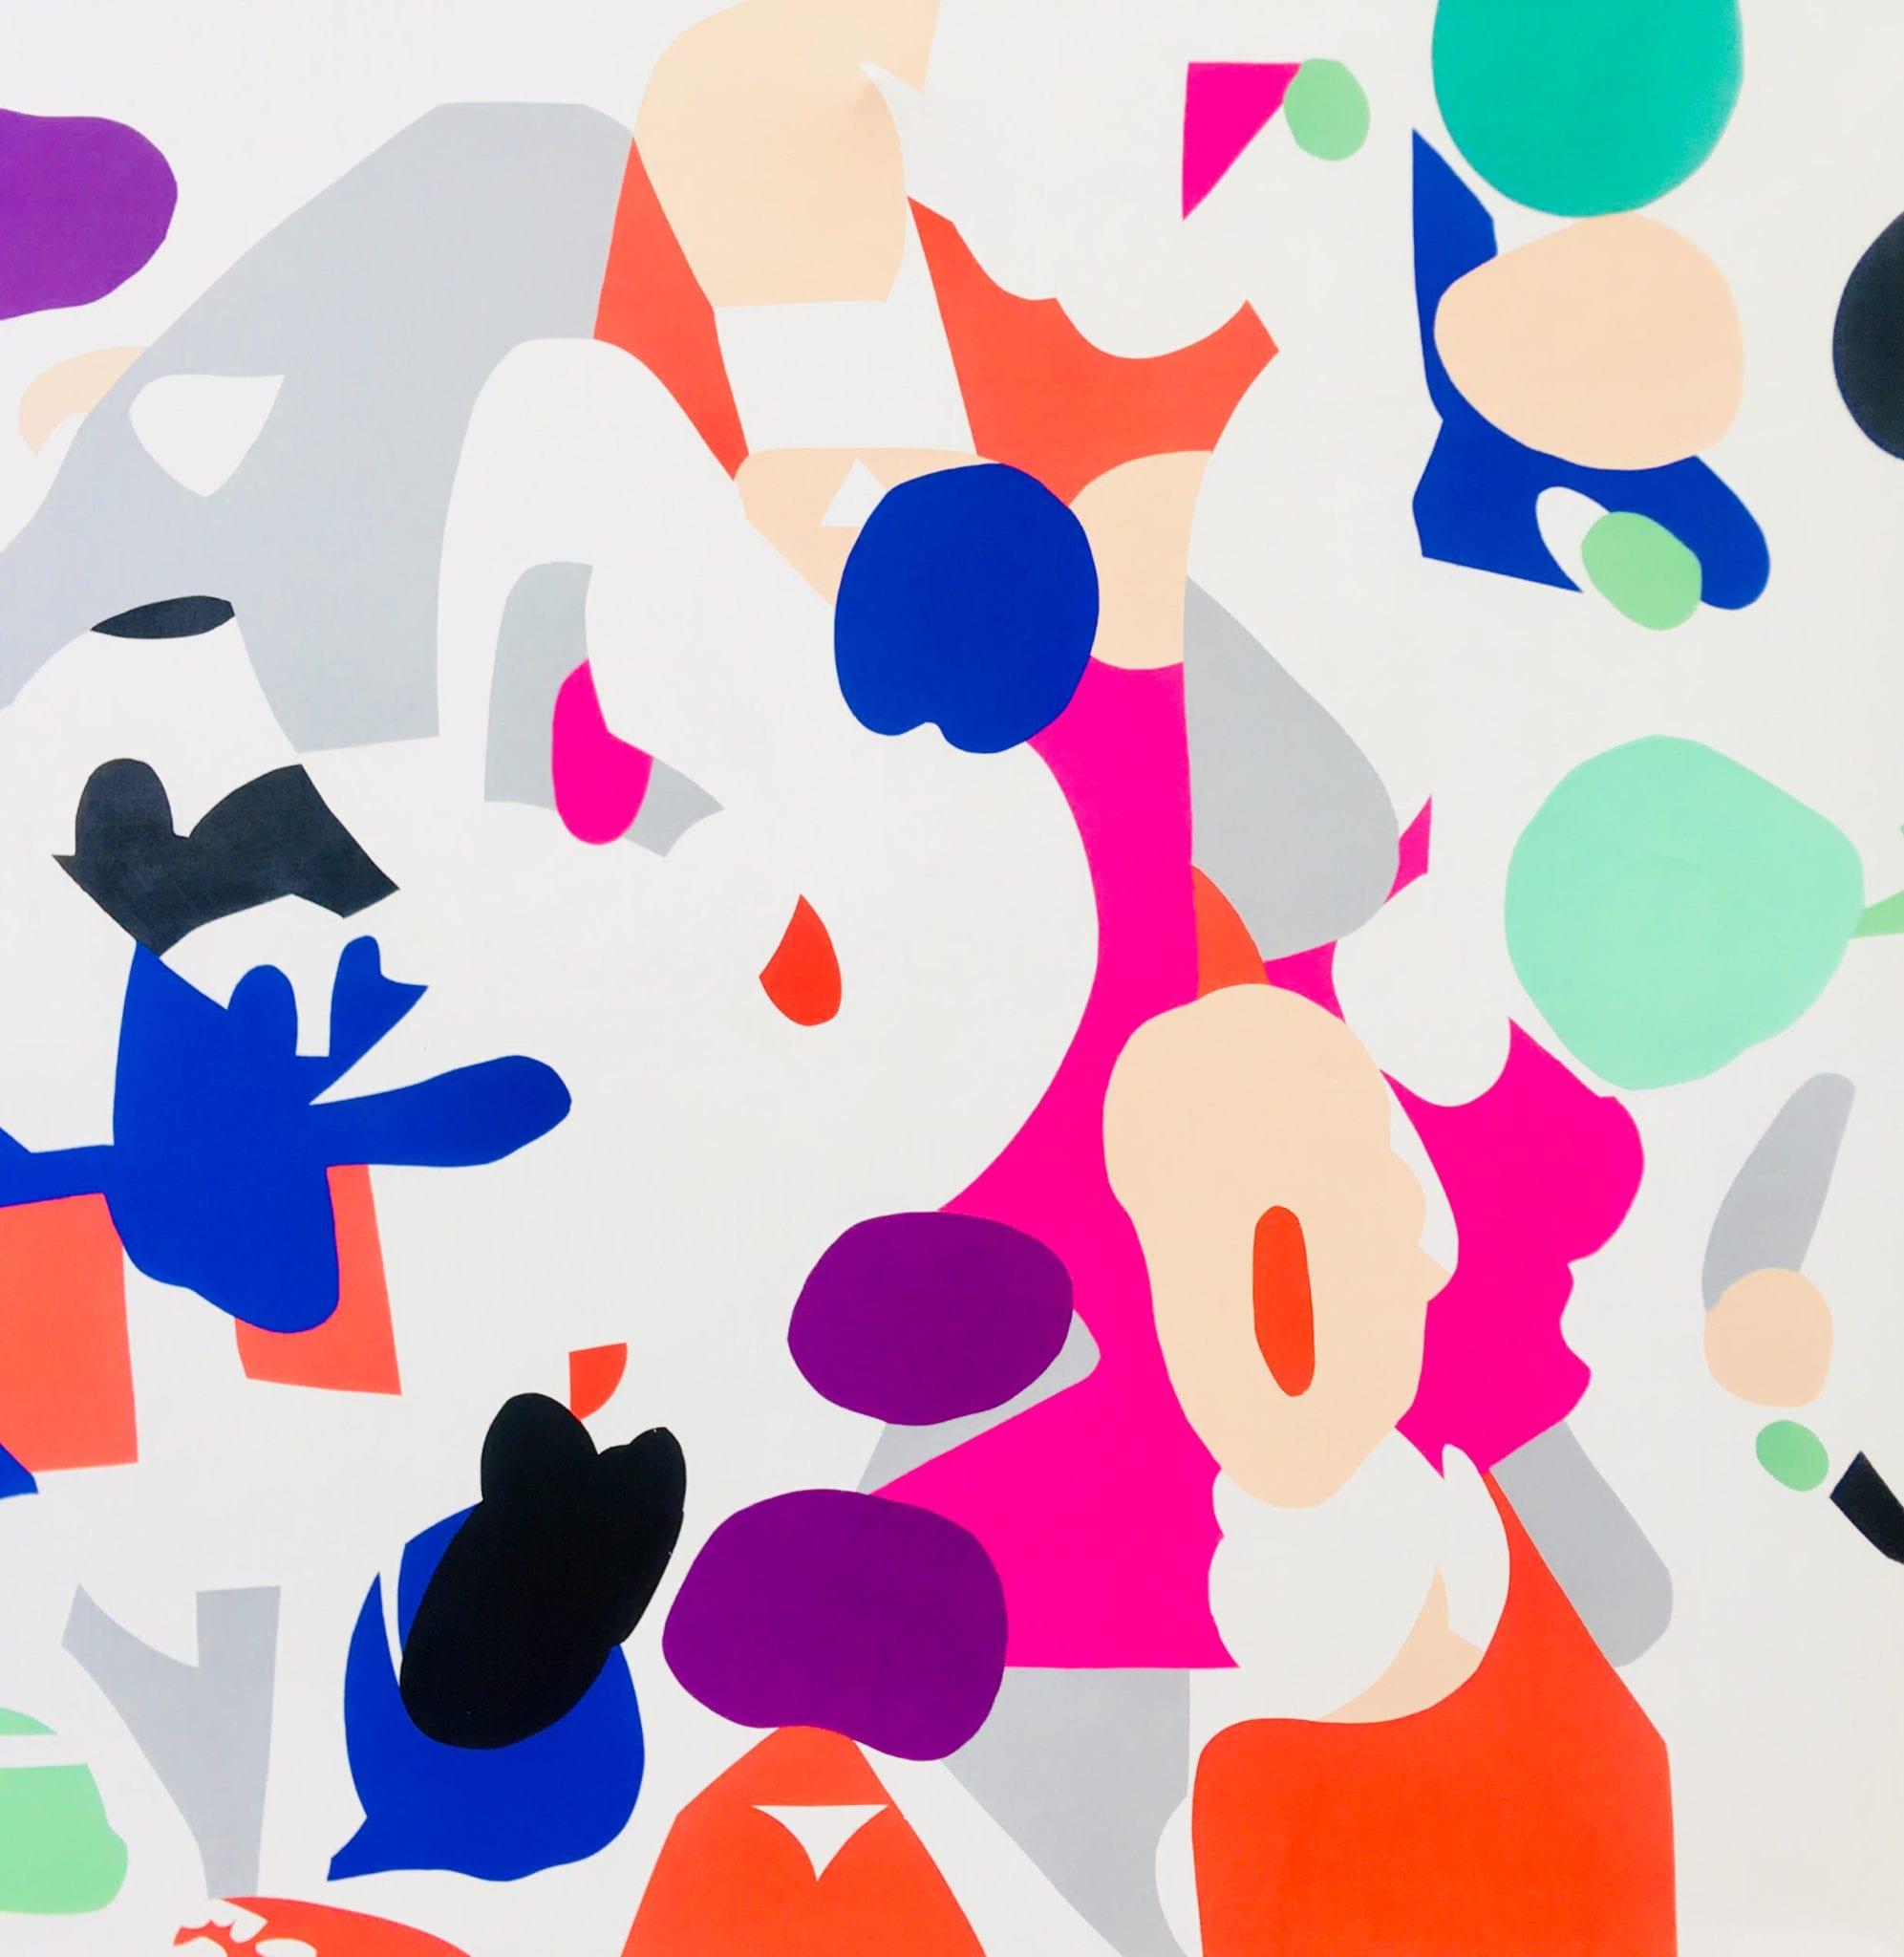 a painting by artist Zuzka Vaclavik